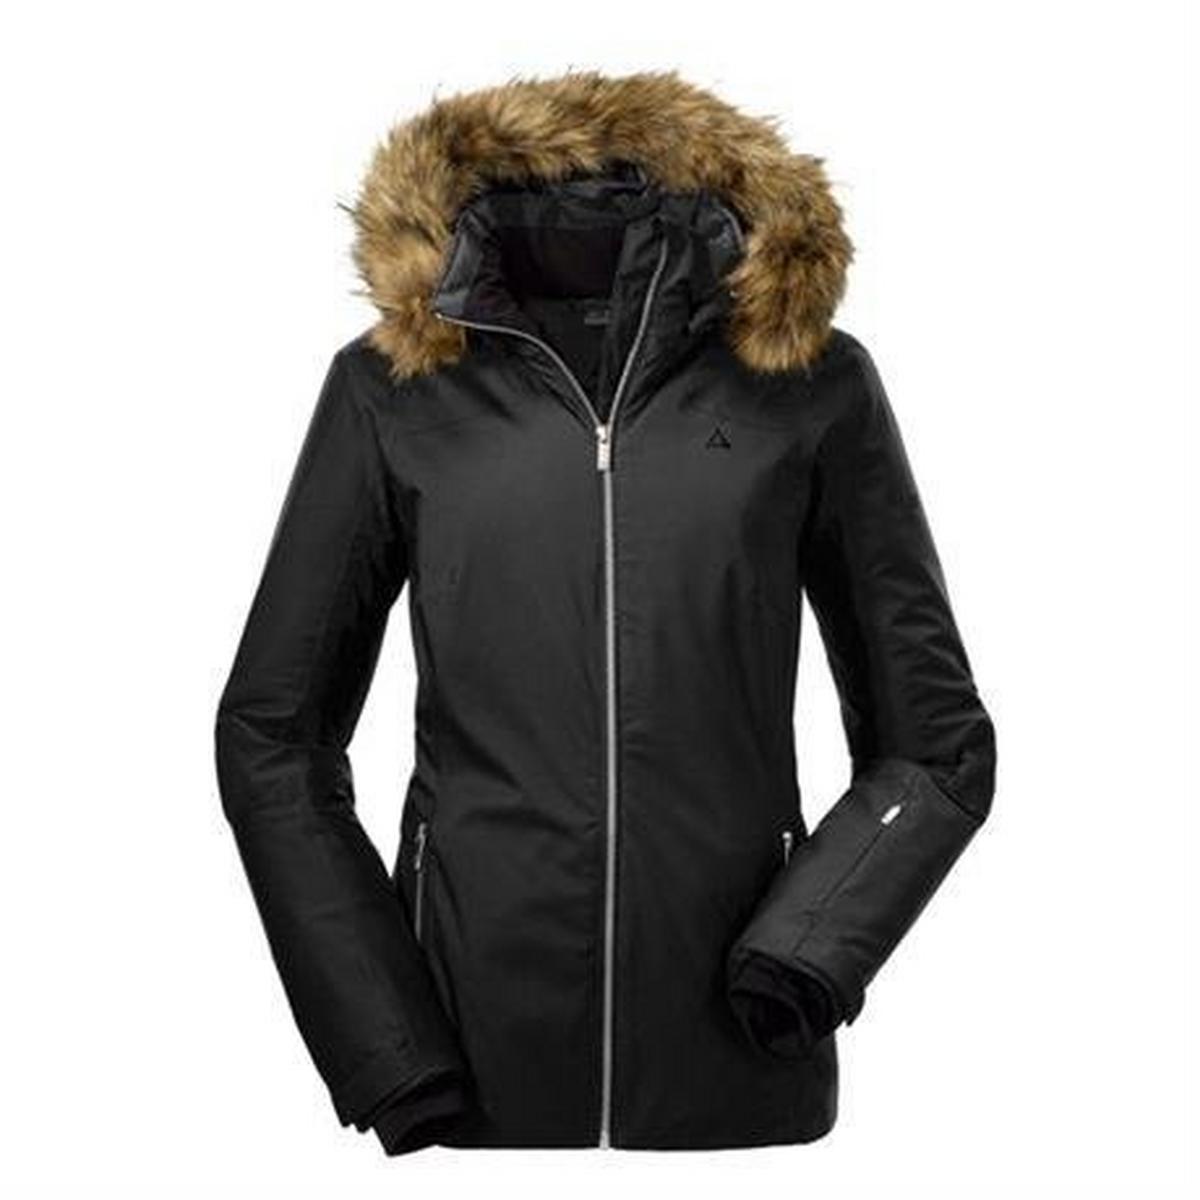 Schoffel SKI Jacket Women's Maria Alm Black